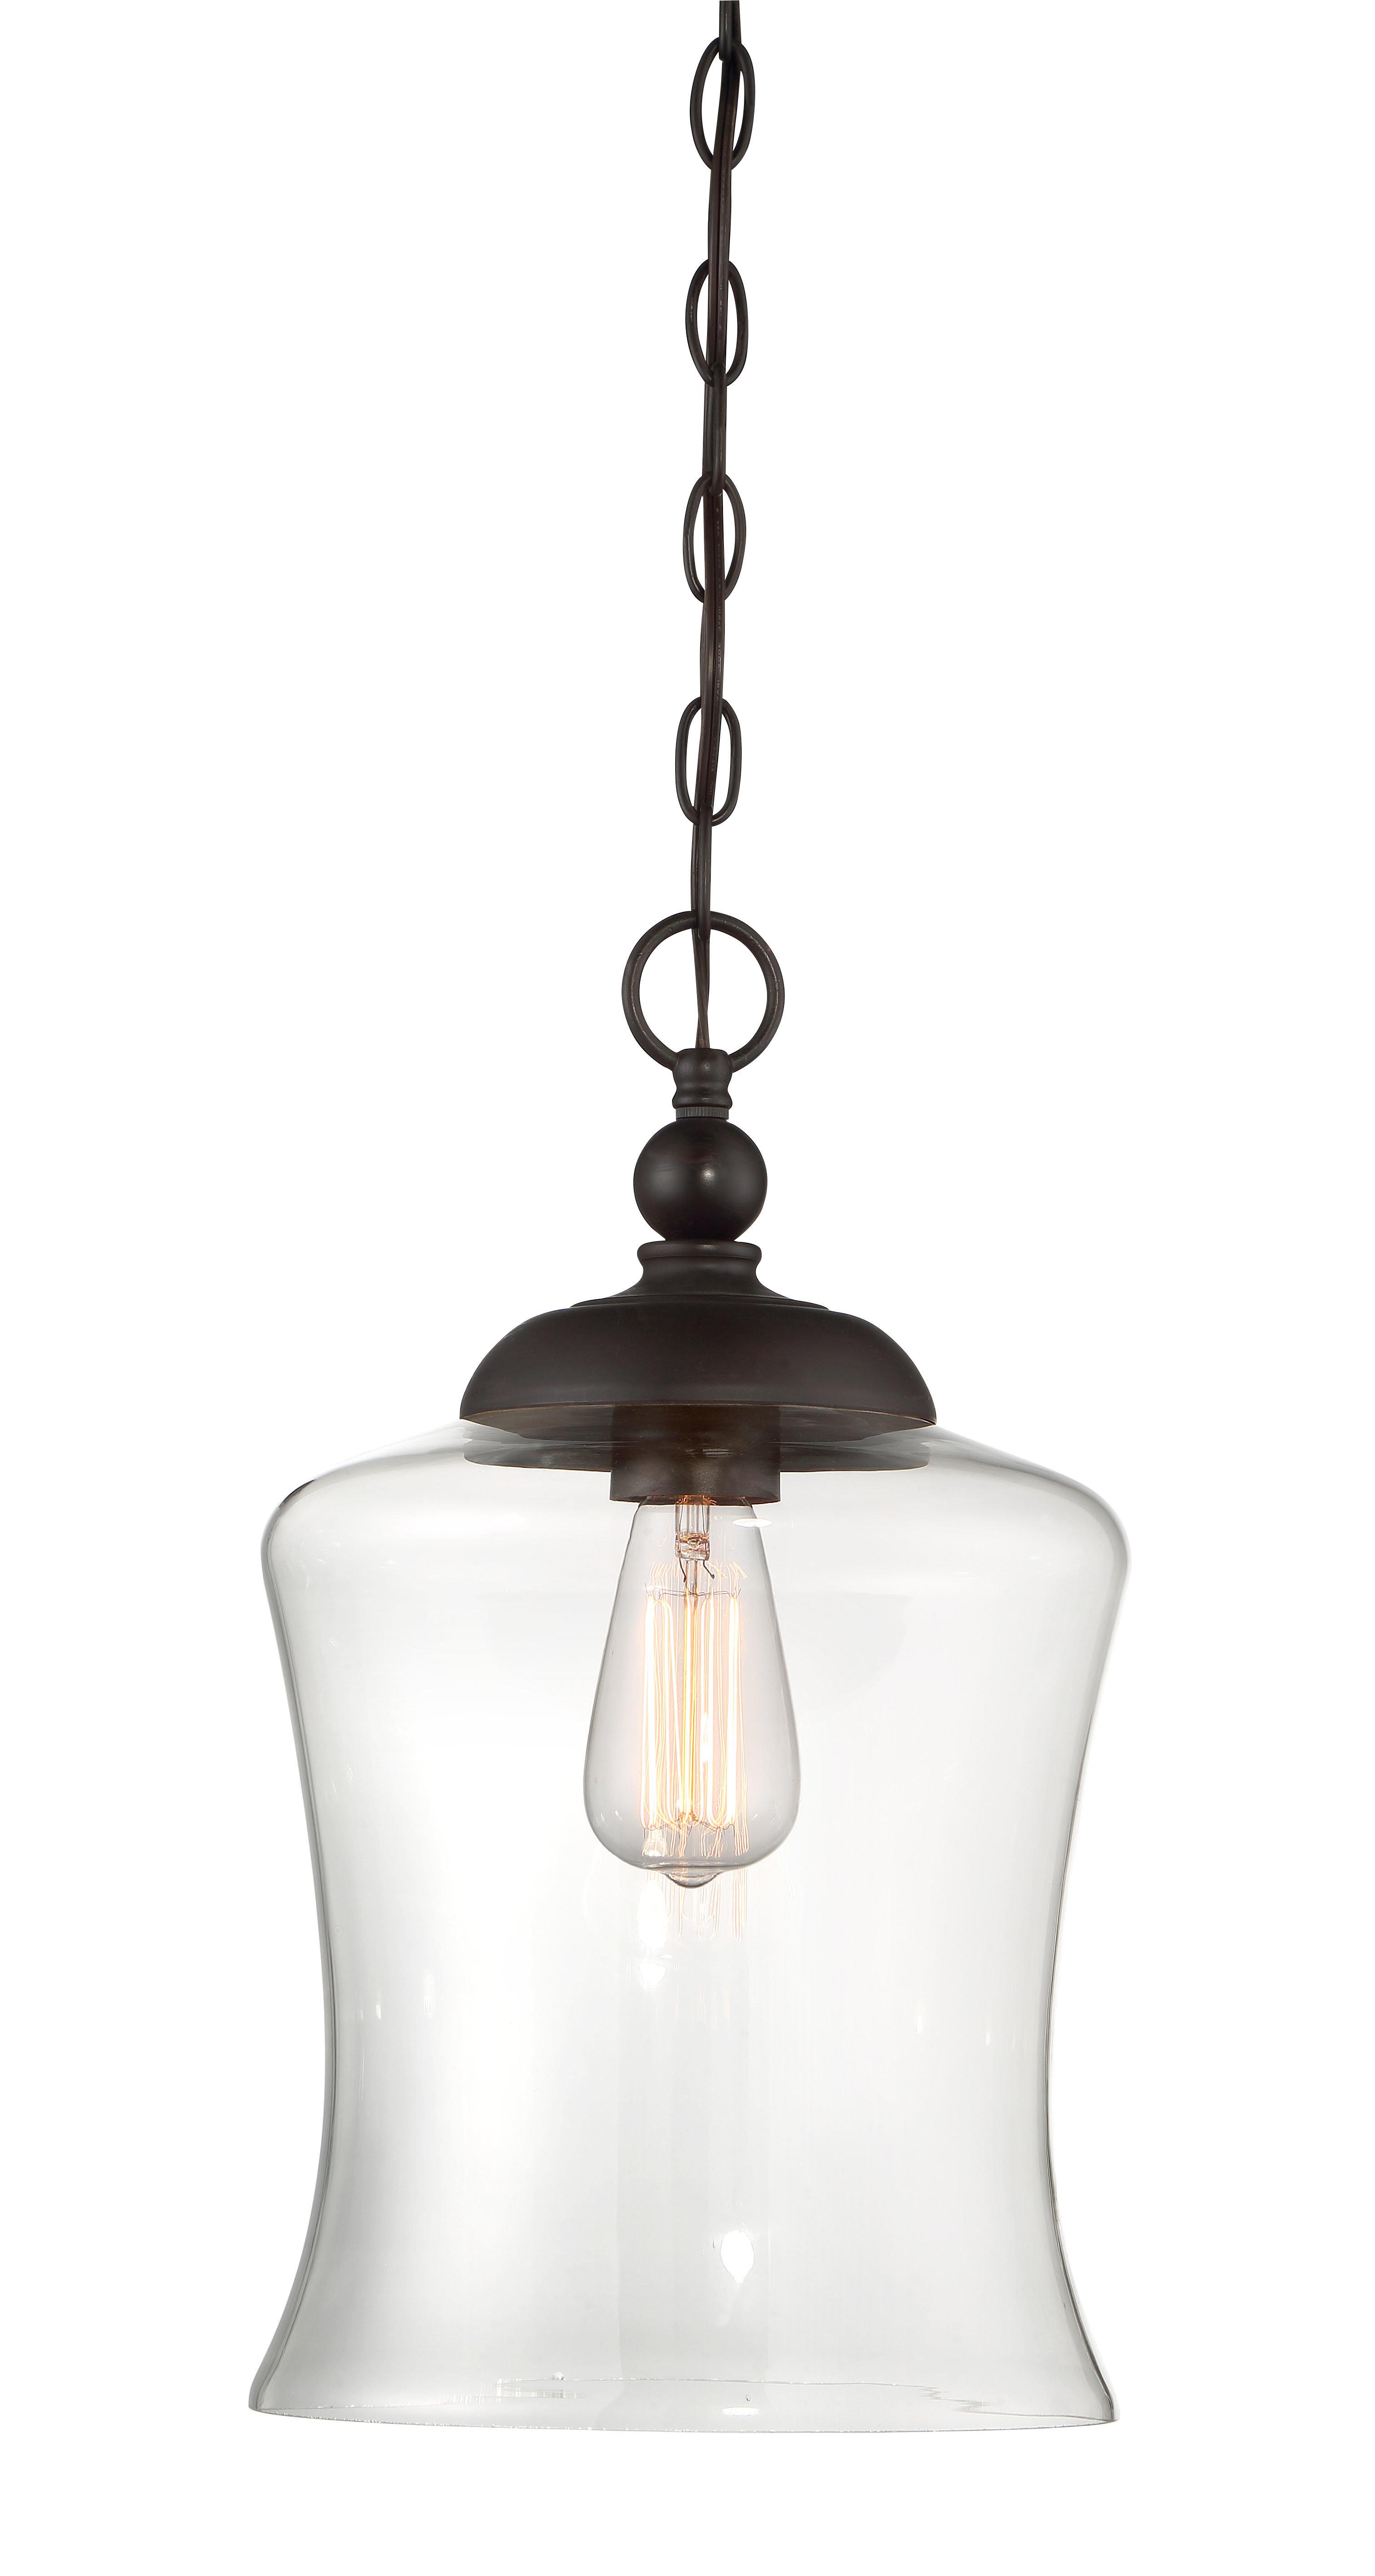 Well Liked Wentzville 1 Light Single Bell Pendants Regarding Charlton Home Wentzville 1 Light Single Bell Pendant (Gallery 3 of 20)